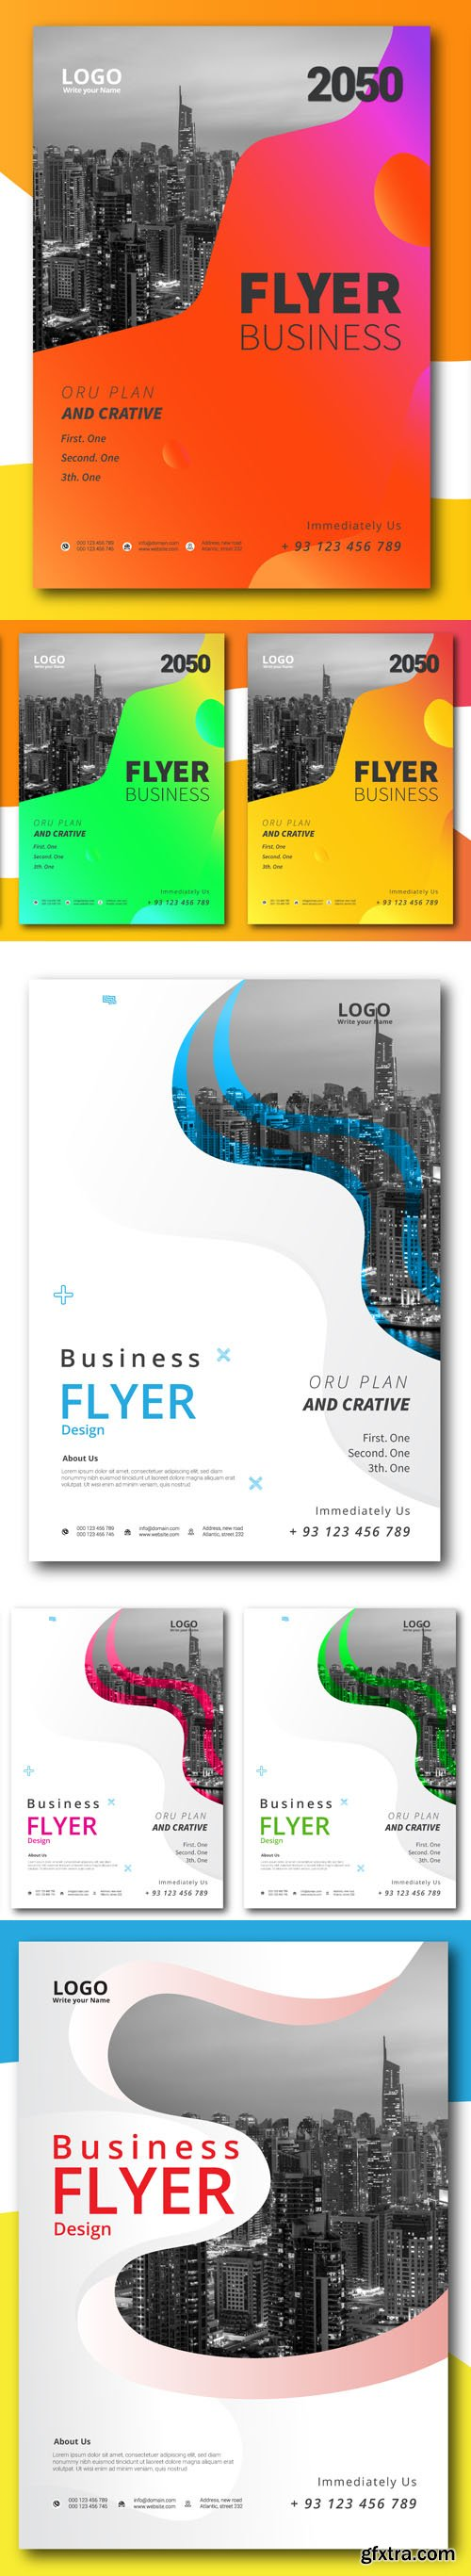 5 Creative Corporate Business Flyers Vector Templates